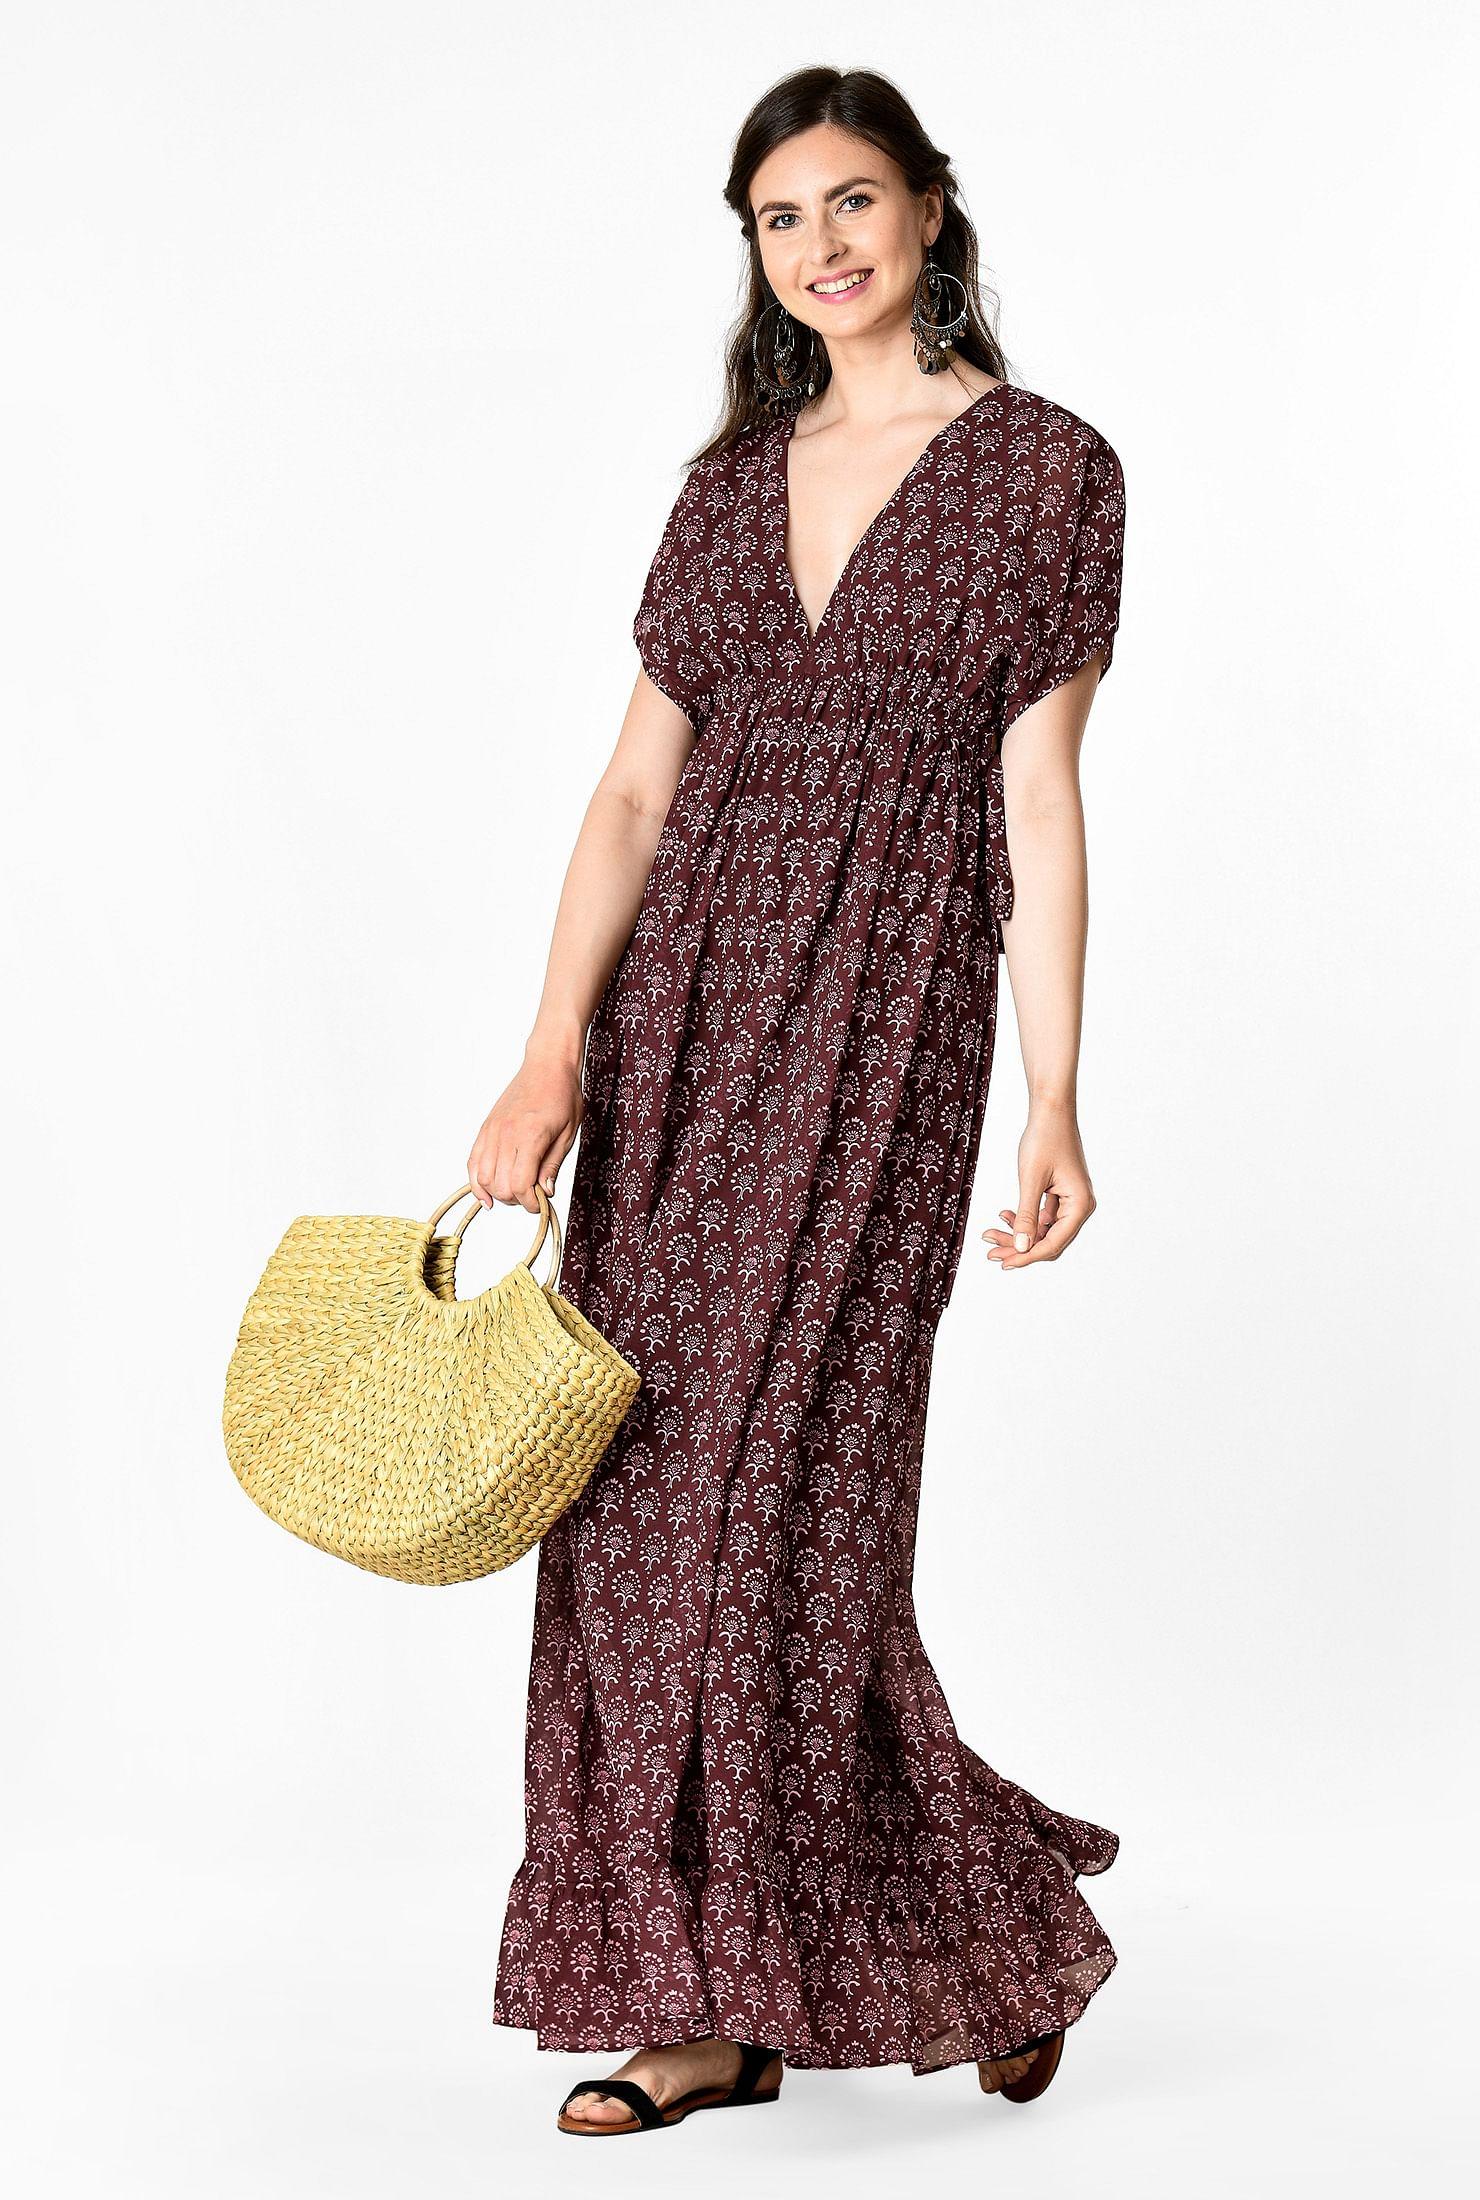 a1795433e2 Floral graphic print drawstring empire maxi dress